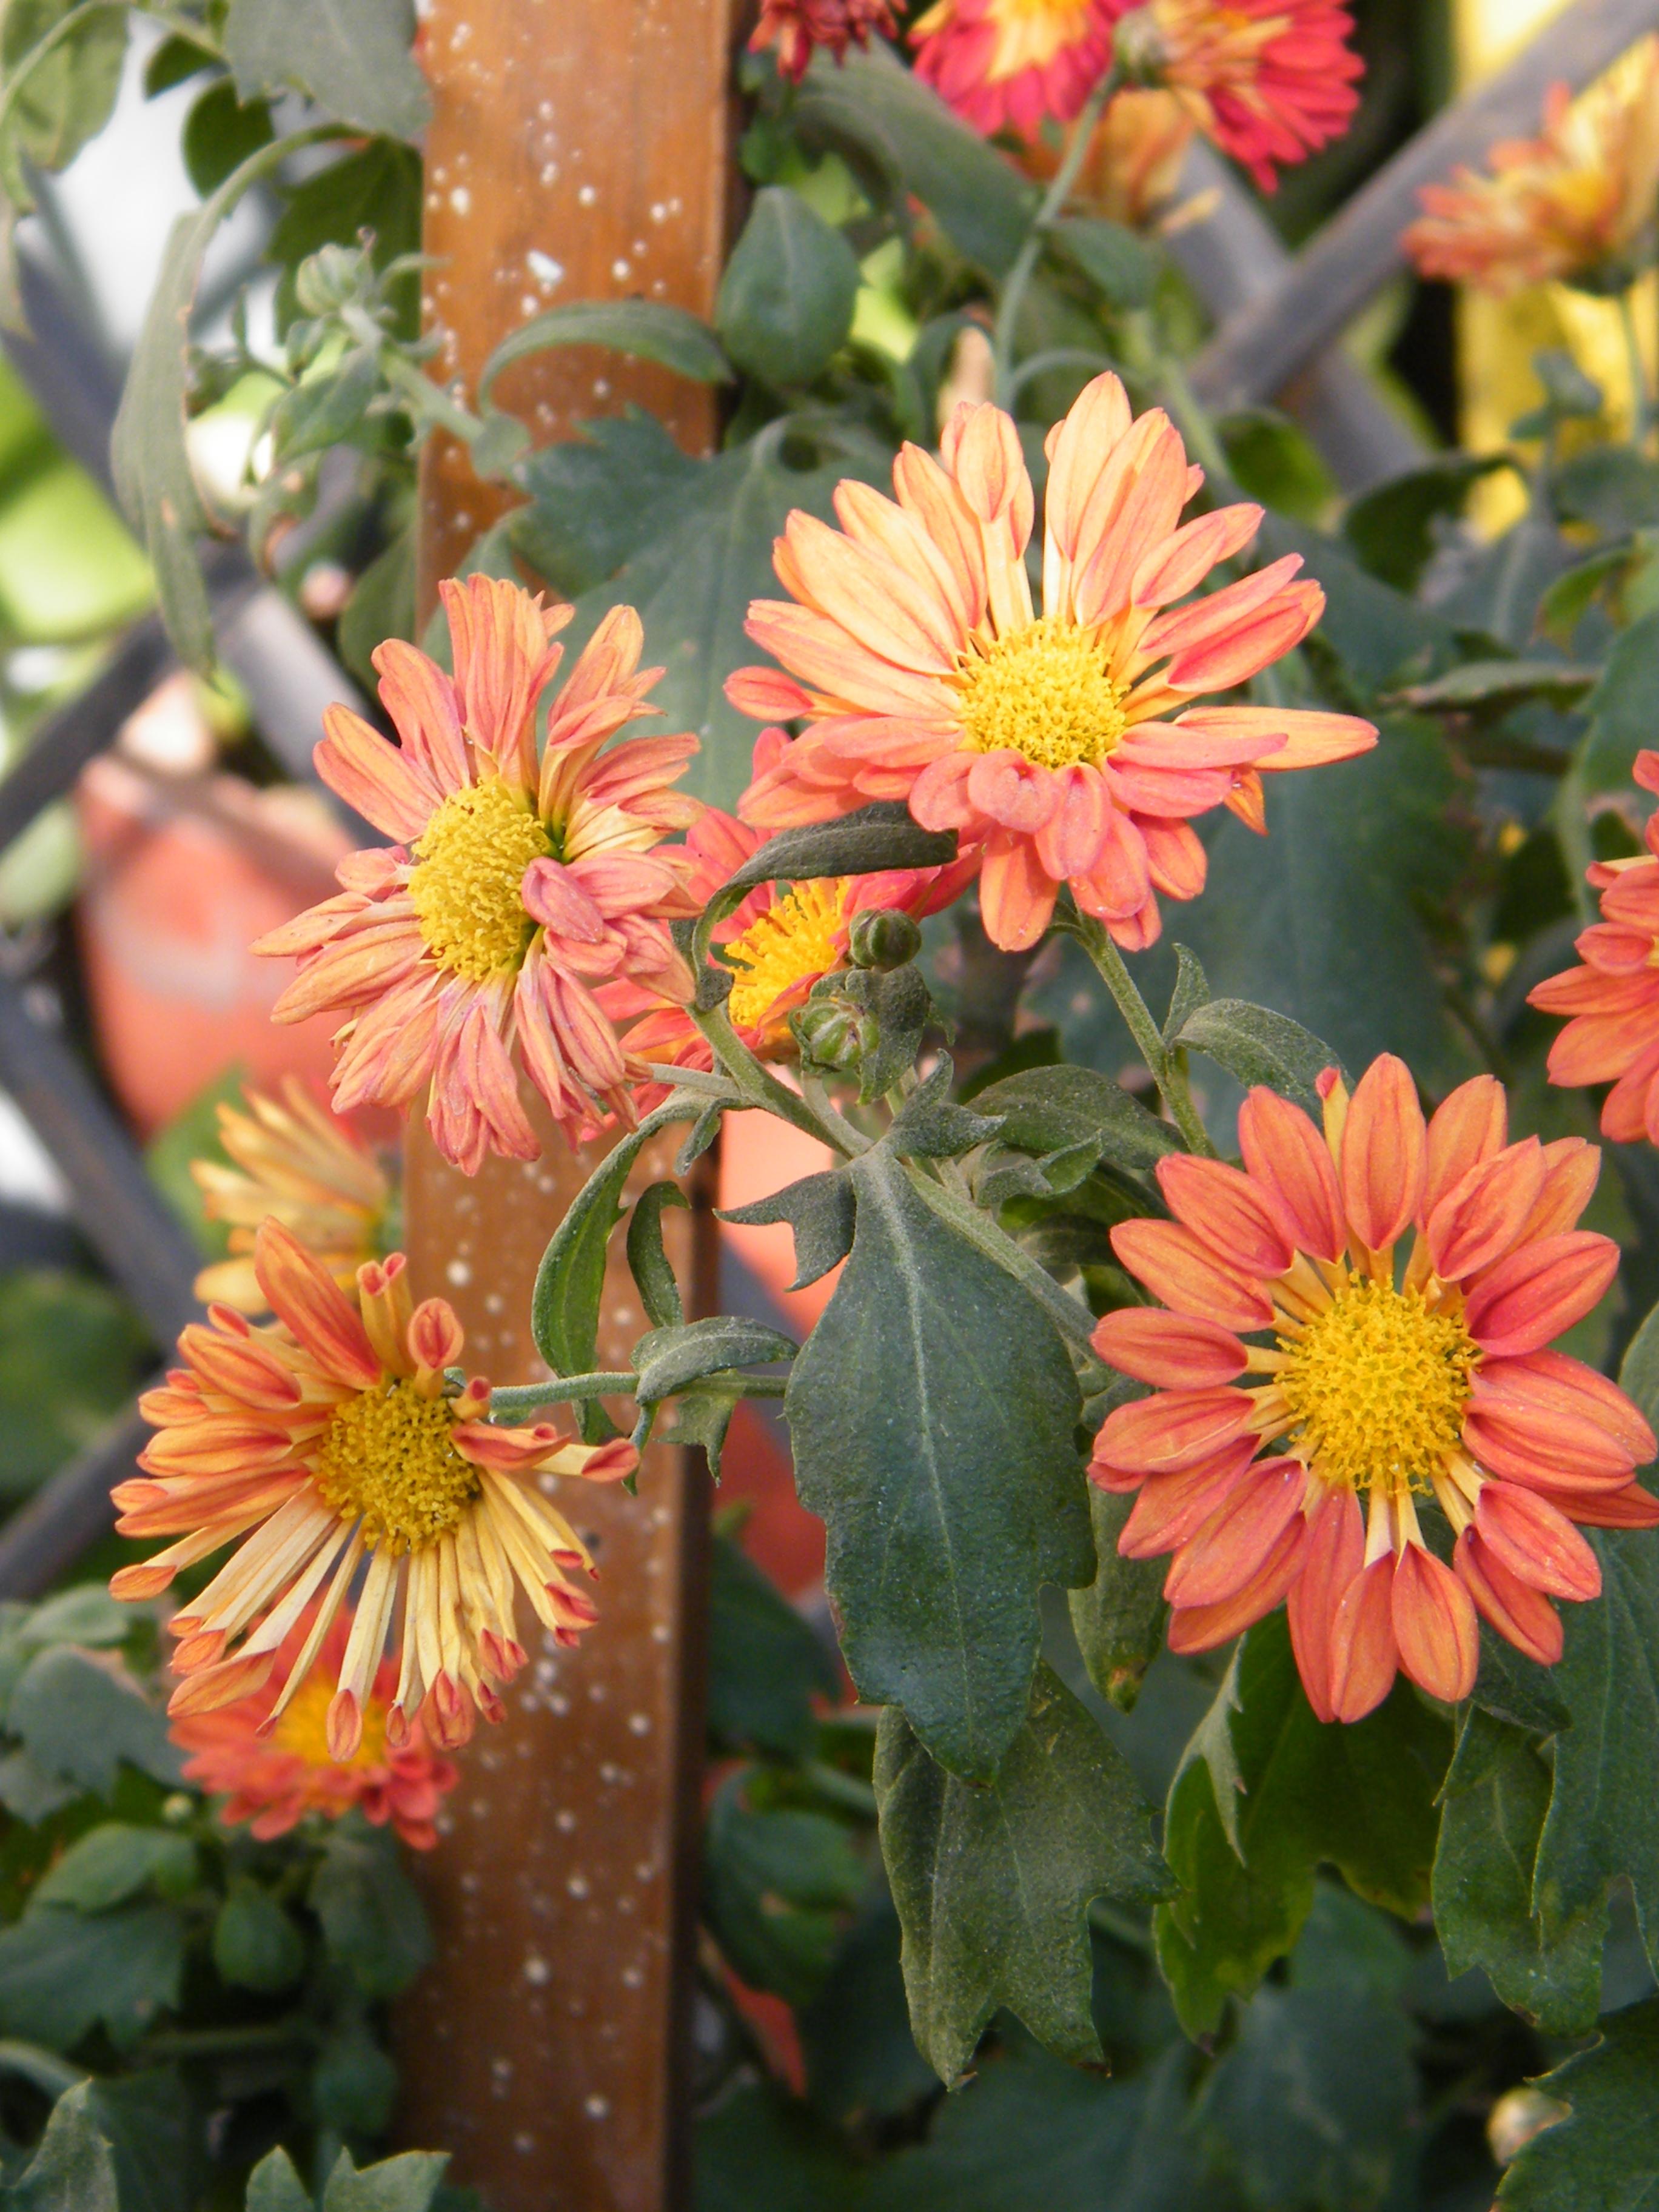 Chrysanthemum Plant Care Guide ~ Varieties | Auntie Dogma ... - photo #48